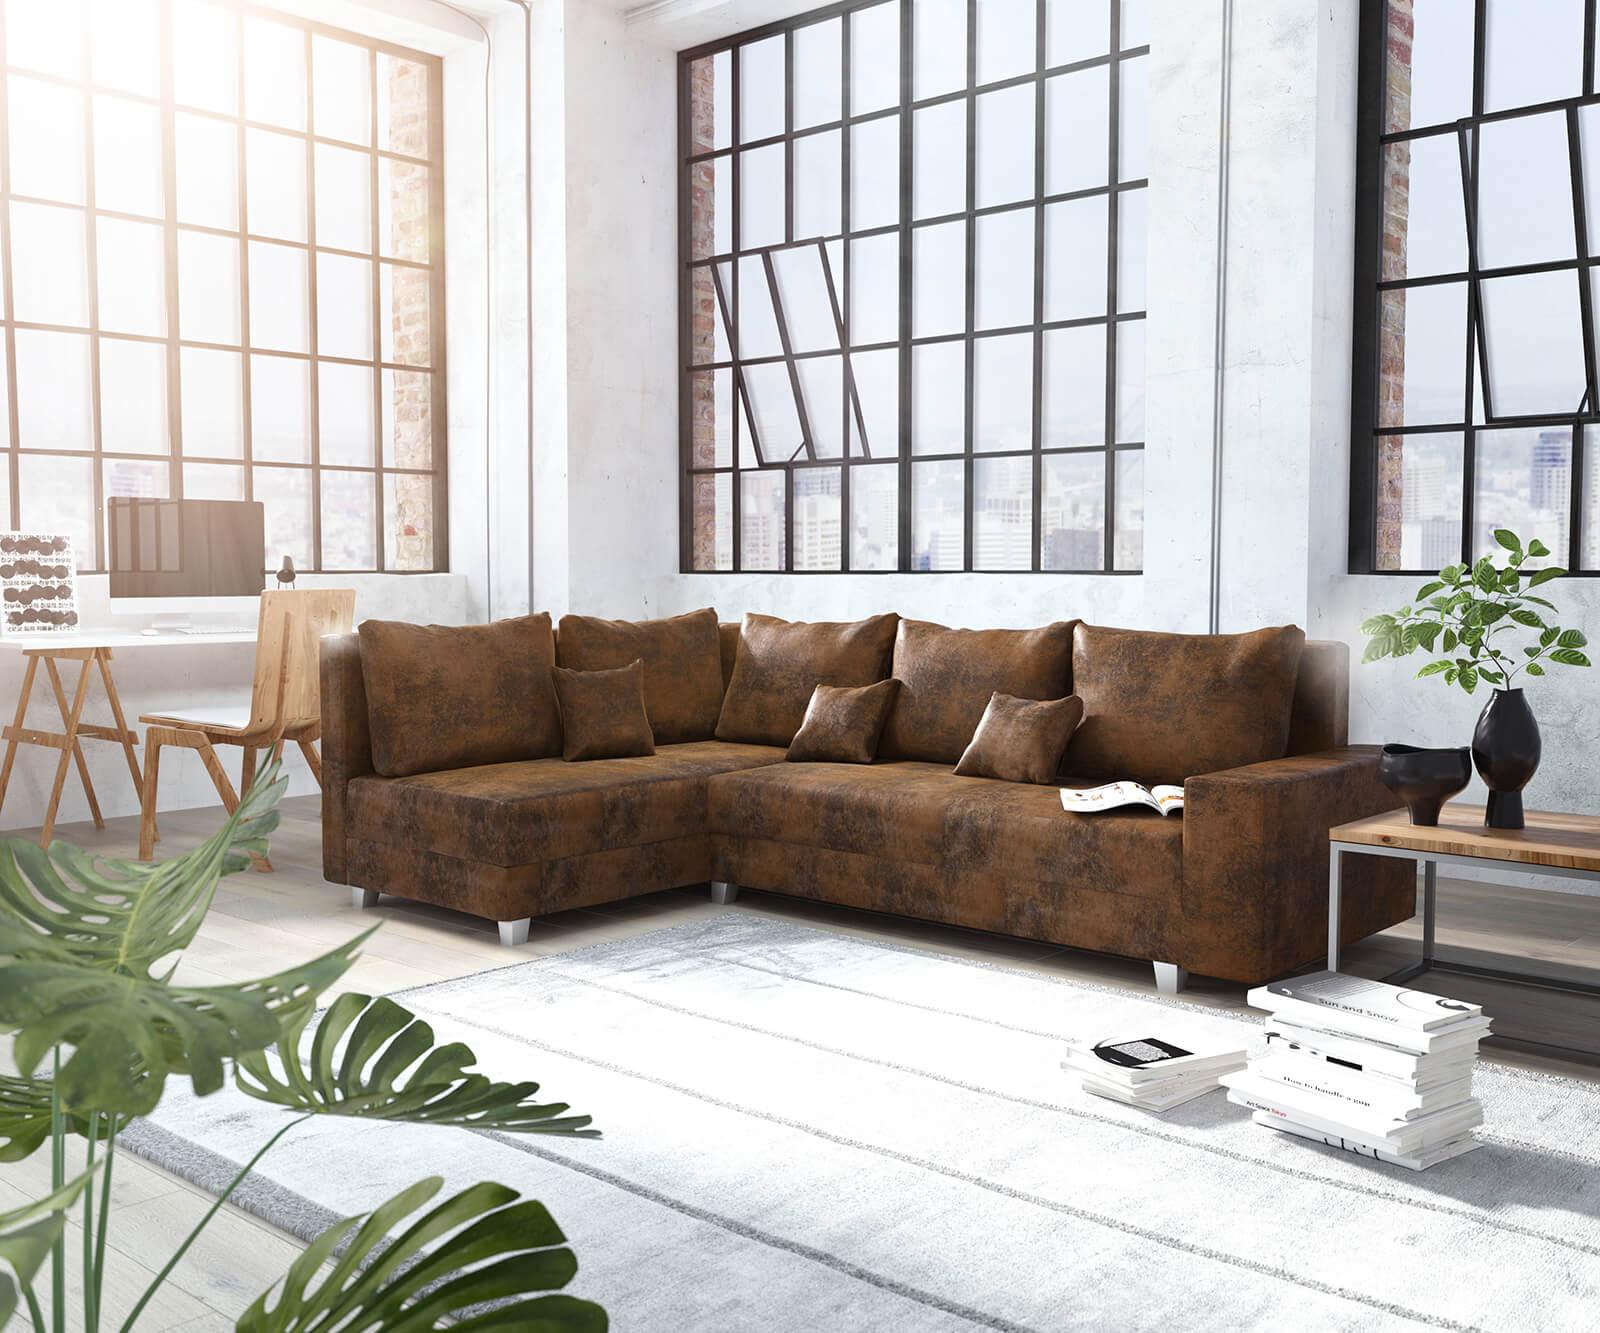 ecksofa panama braun ottomane links modulsofa m bel sofas ecksofas. Black Bedroom Furniture Sets. Home Design Ideas